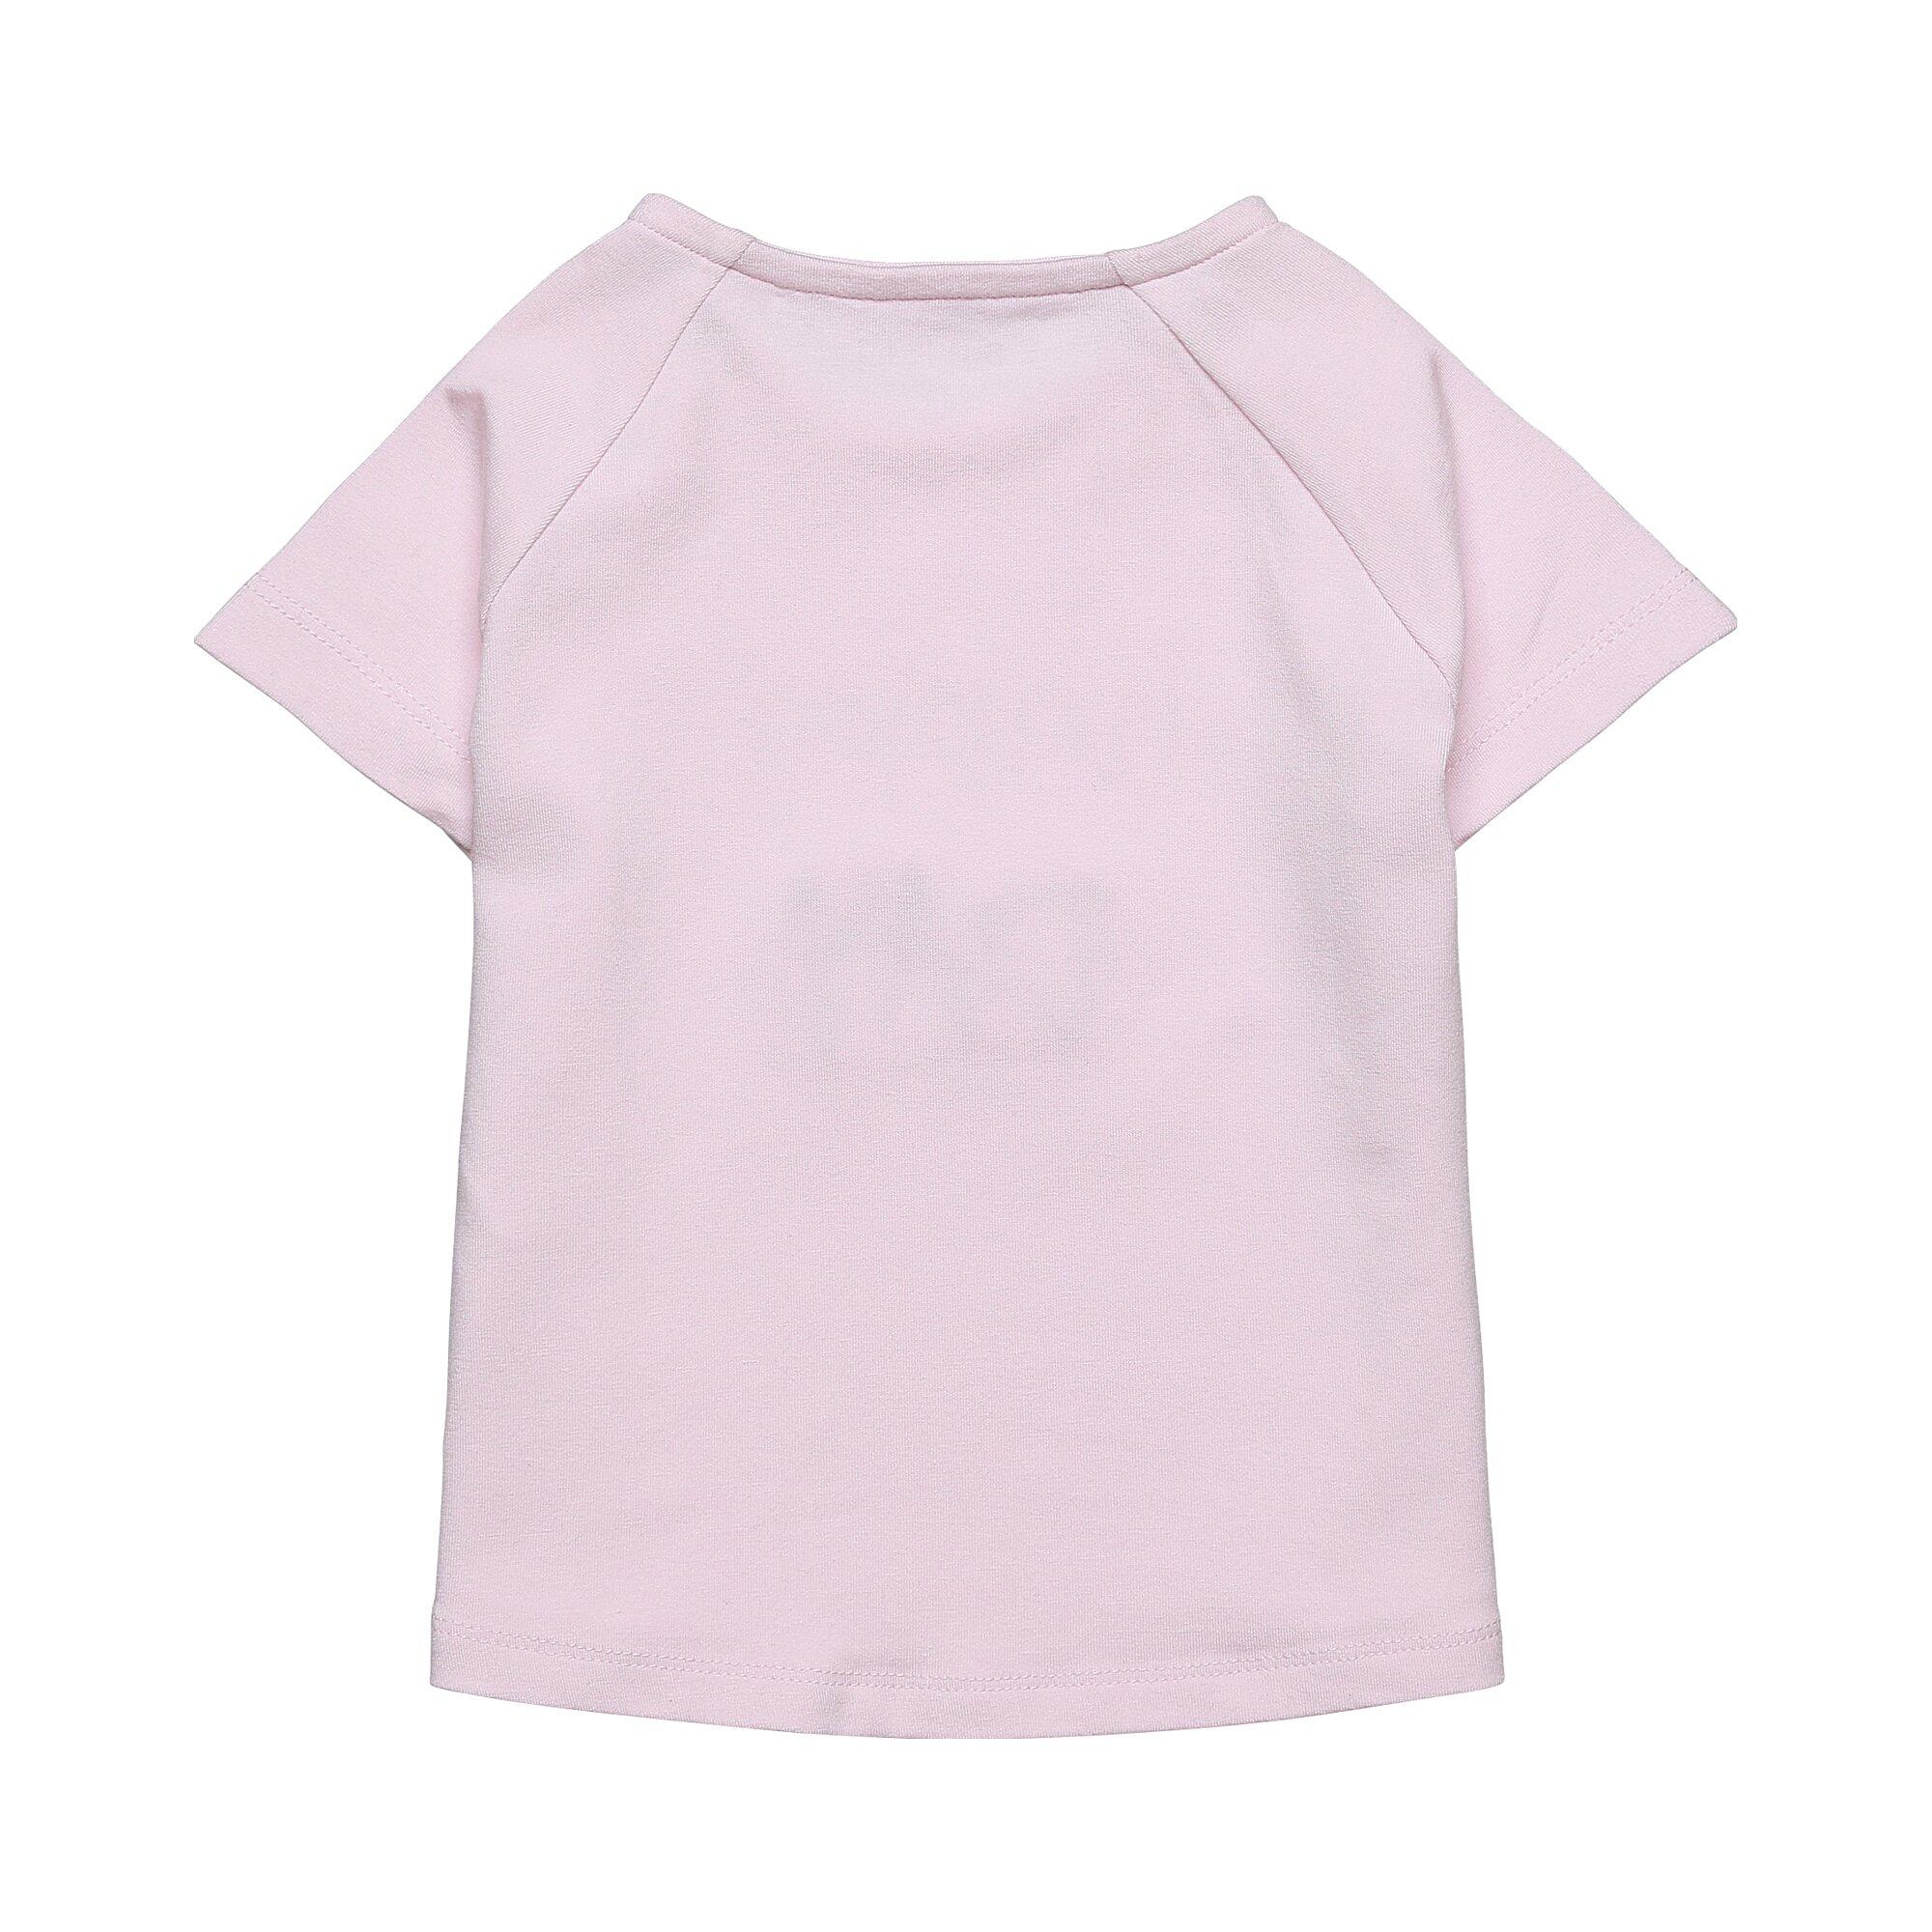 esprit-t-shirt-kurzarm-happy-day